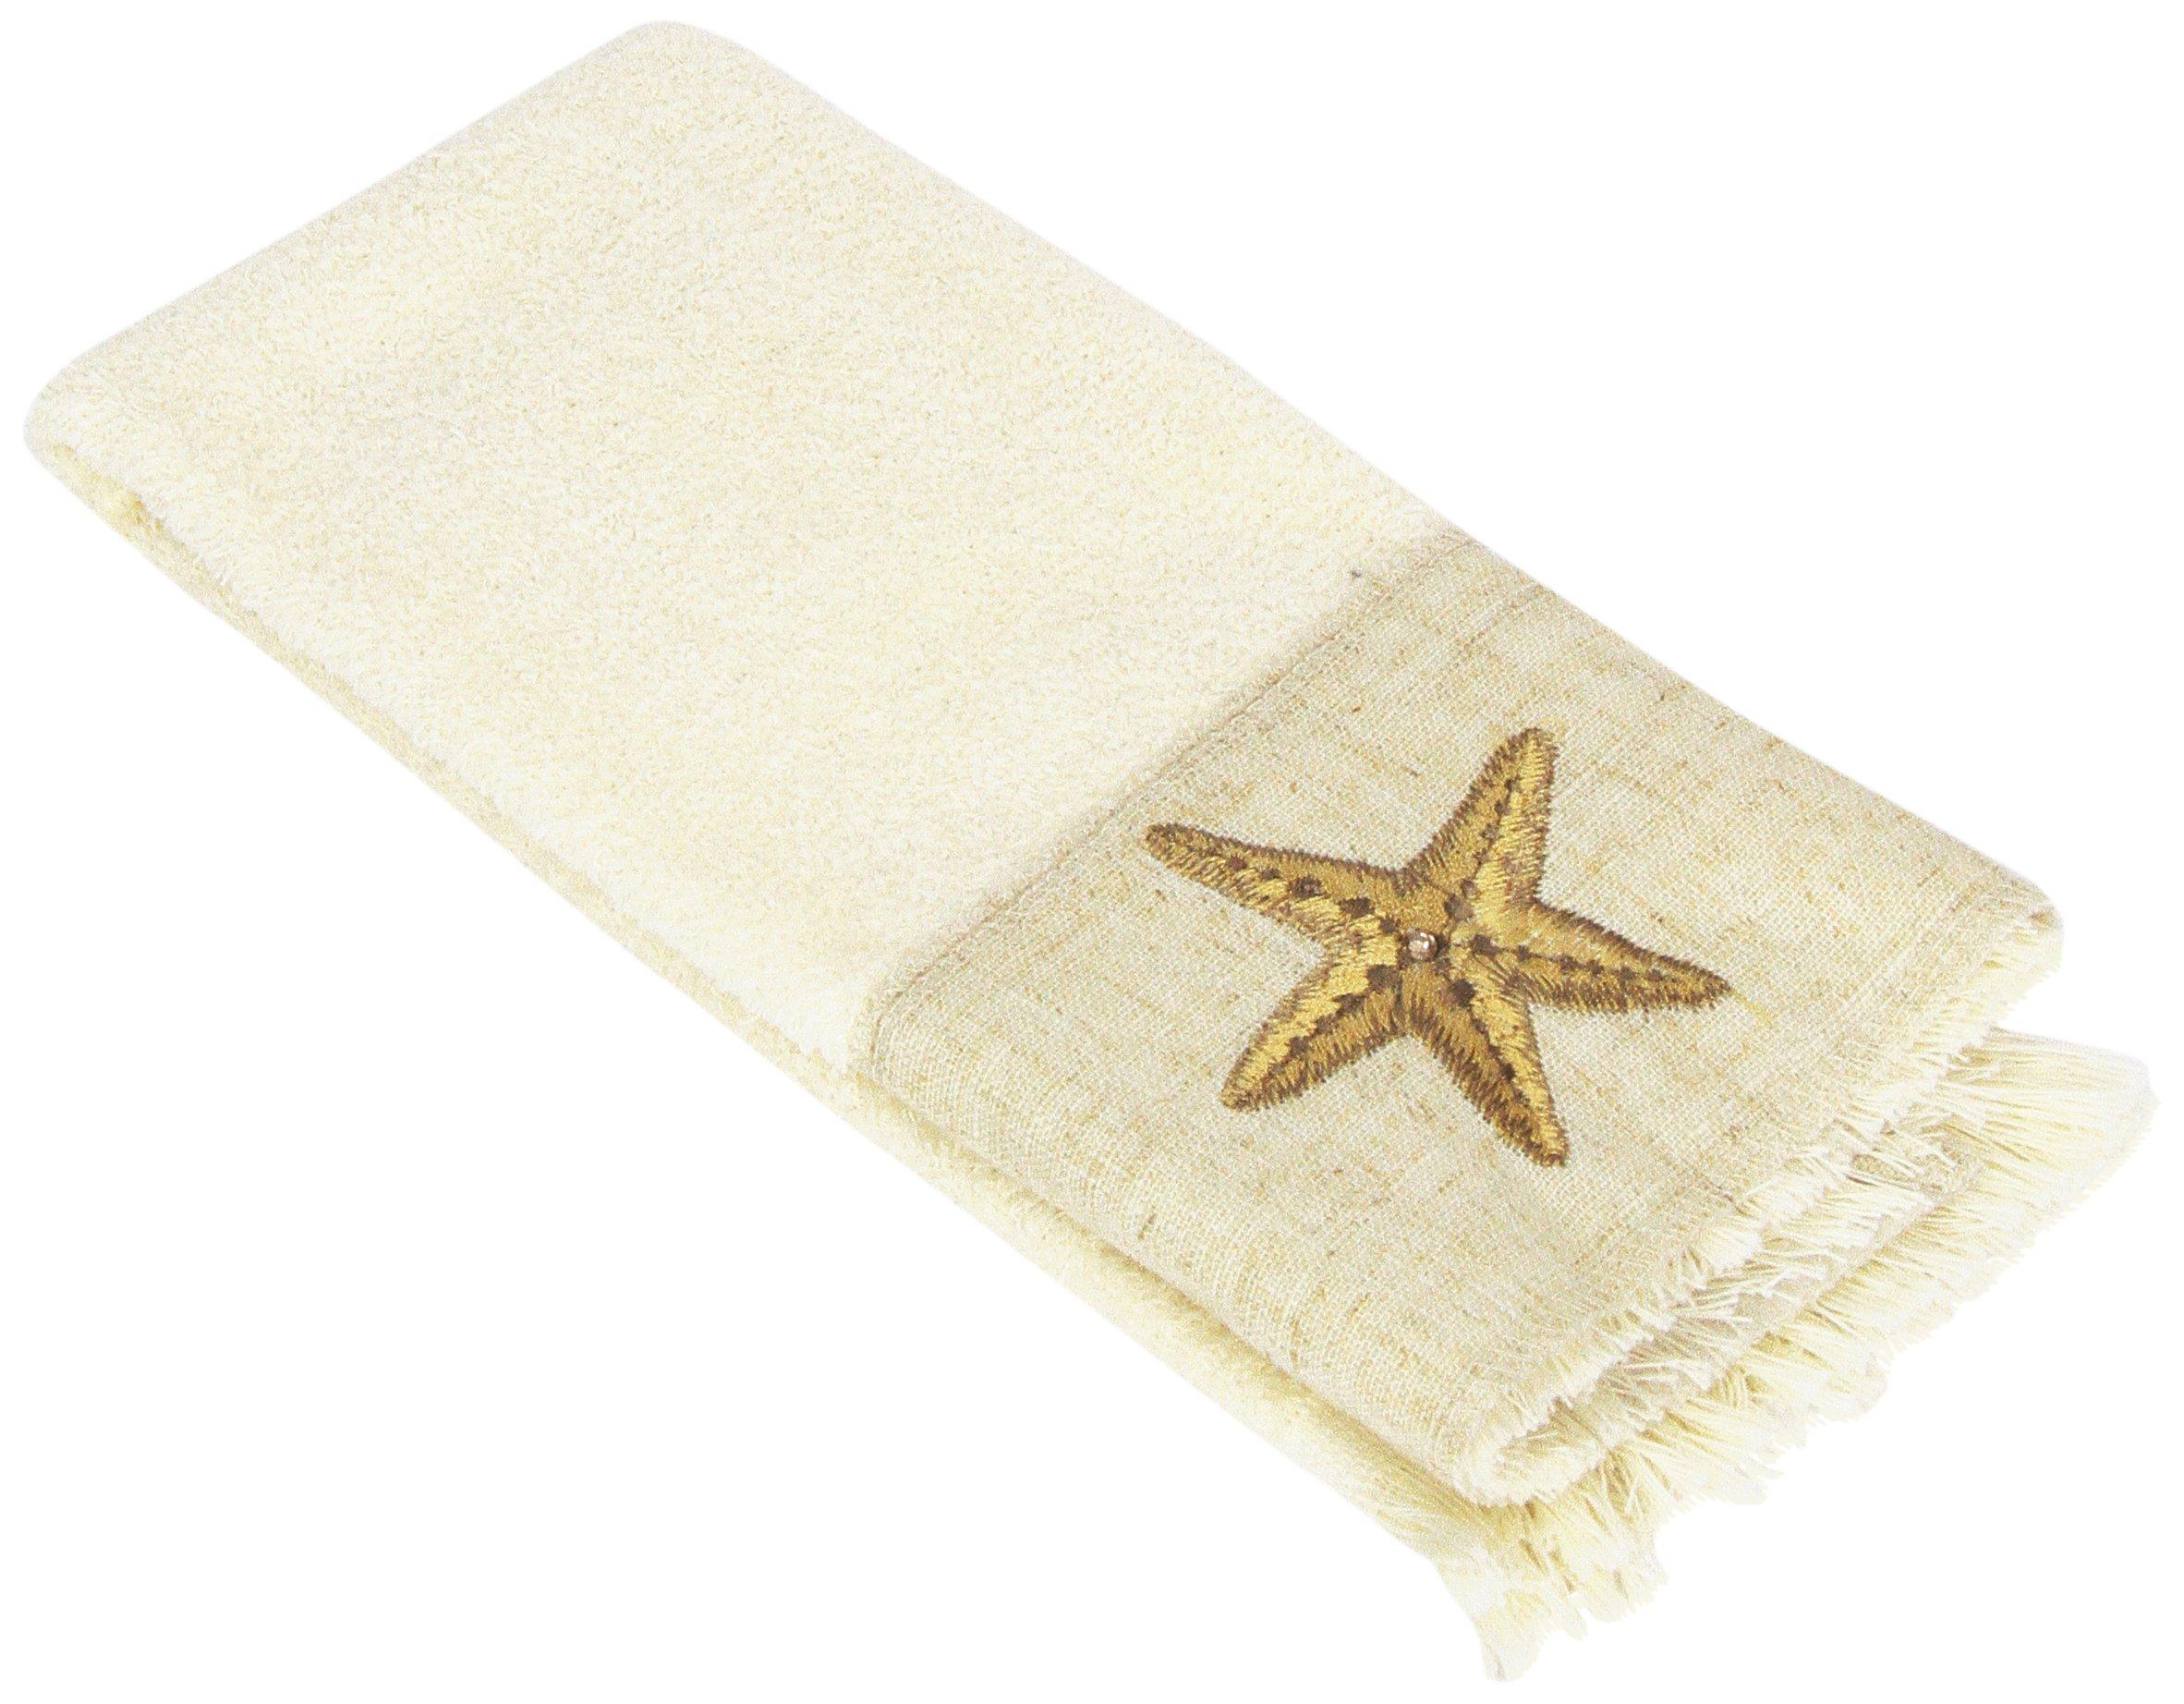 Avanti Sea Treasure Fingertip Towel, Ivory by Avanti Linens (Image #1)